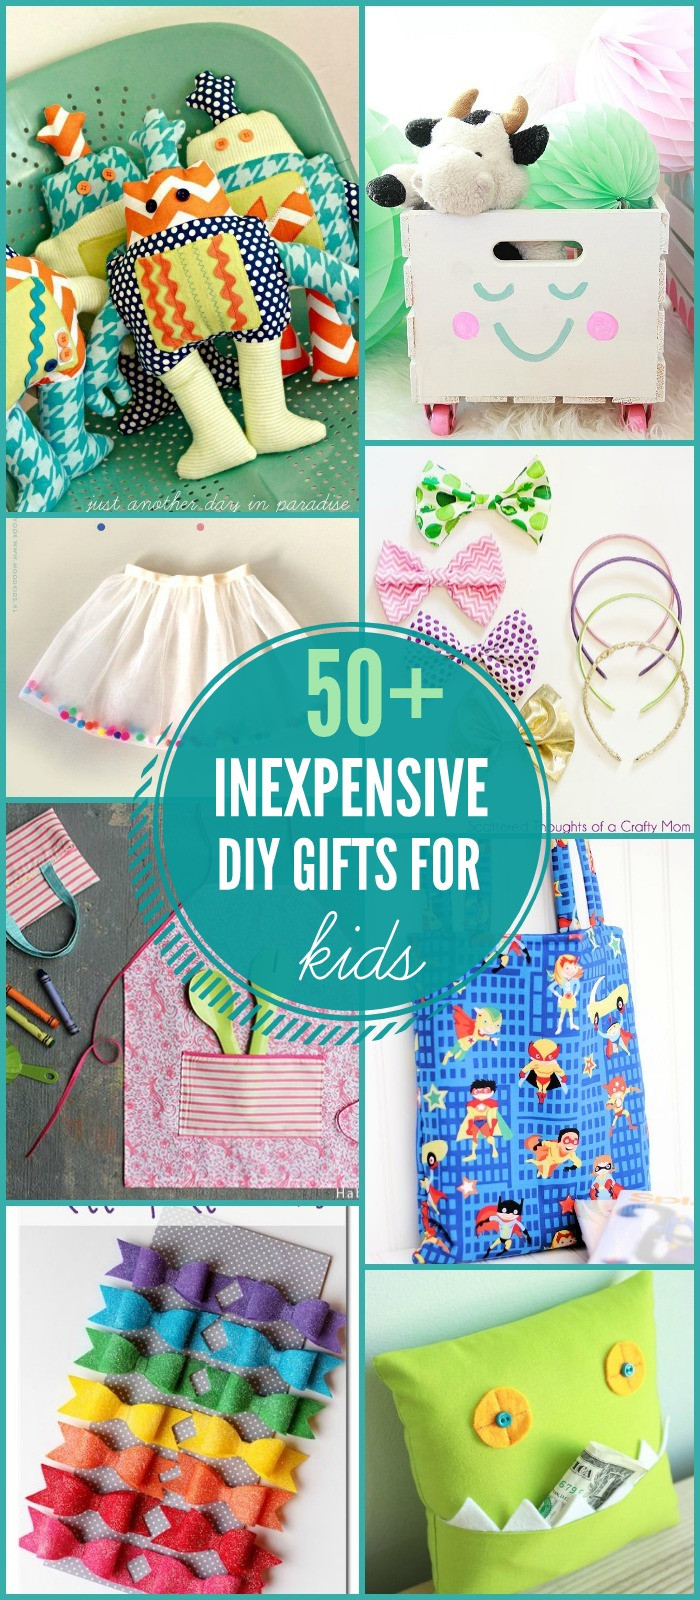 DIY Ideas For Kids  DIY Gifts for Kids